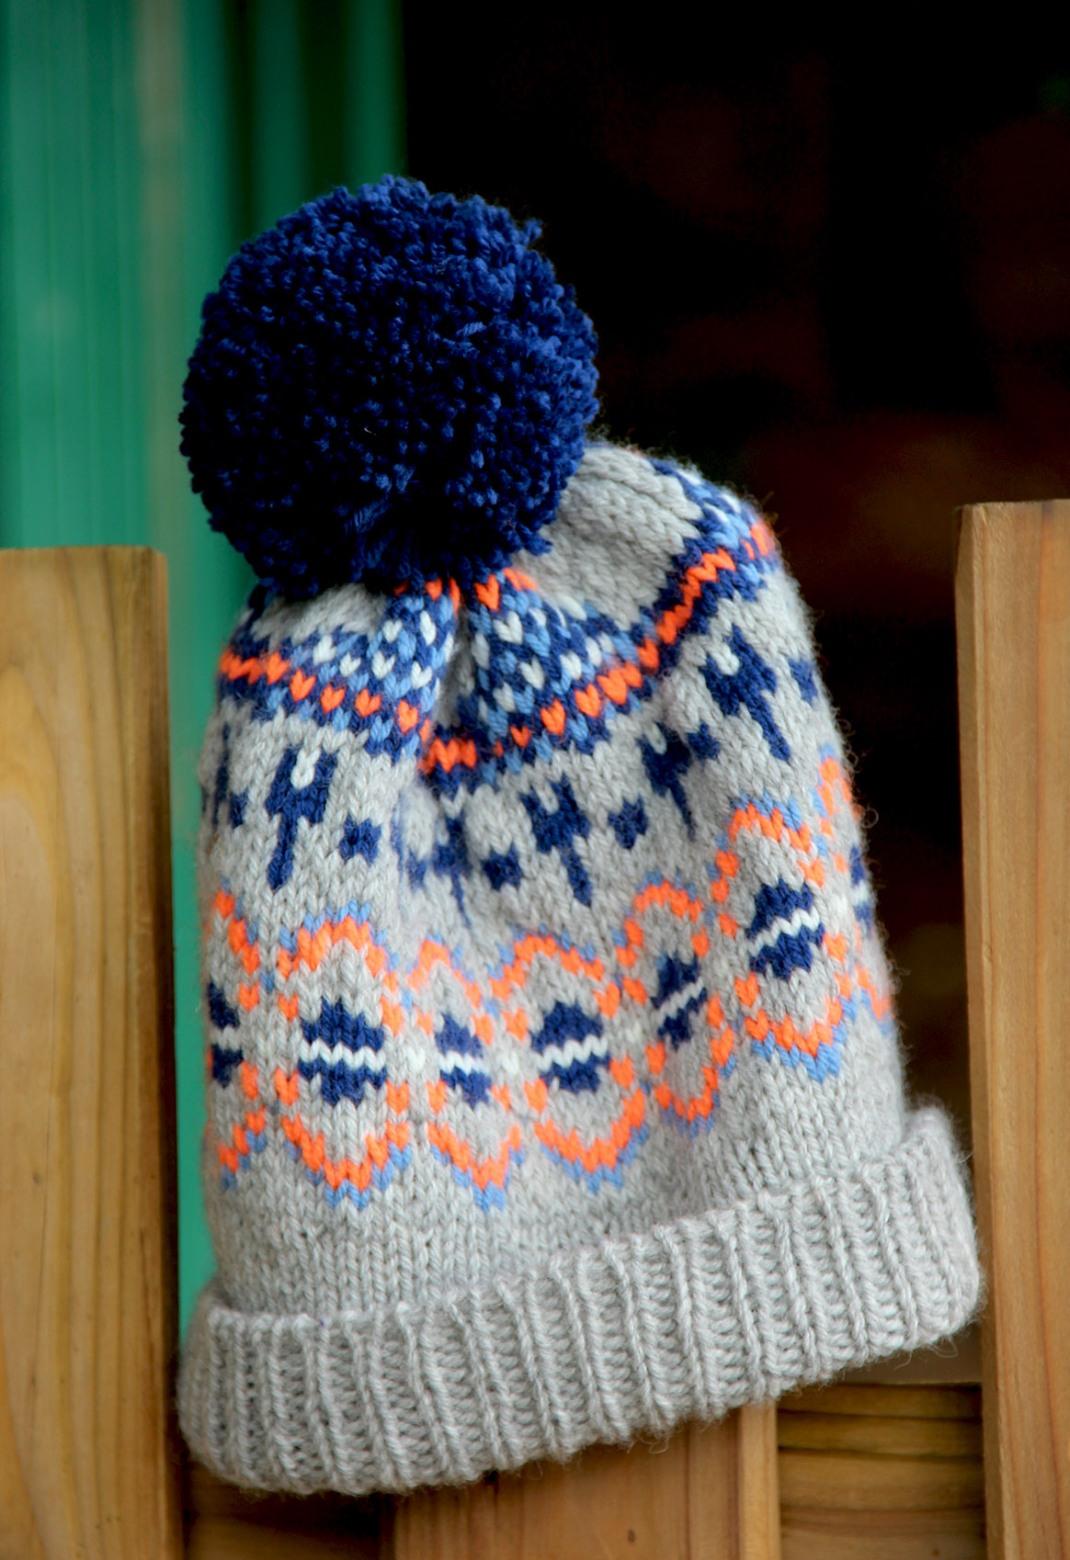 Oonski bonnet jacquard PurPle Laines